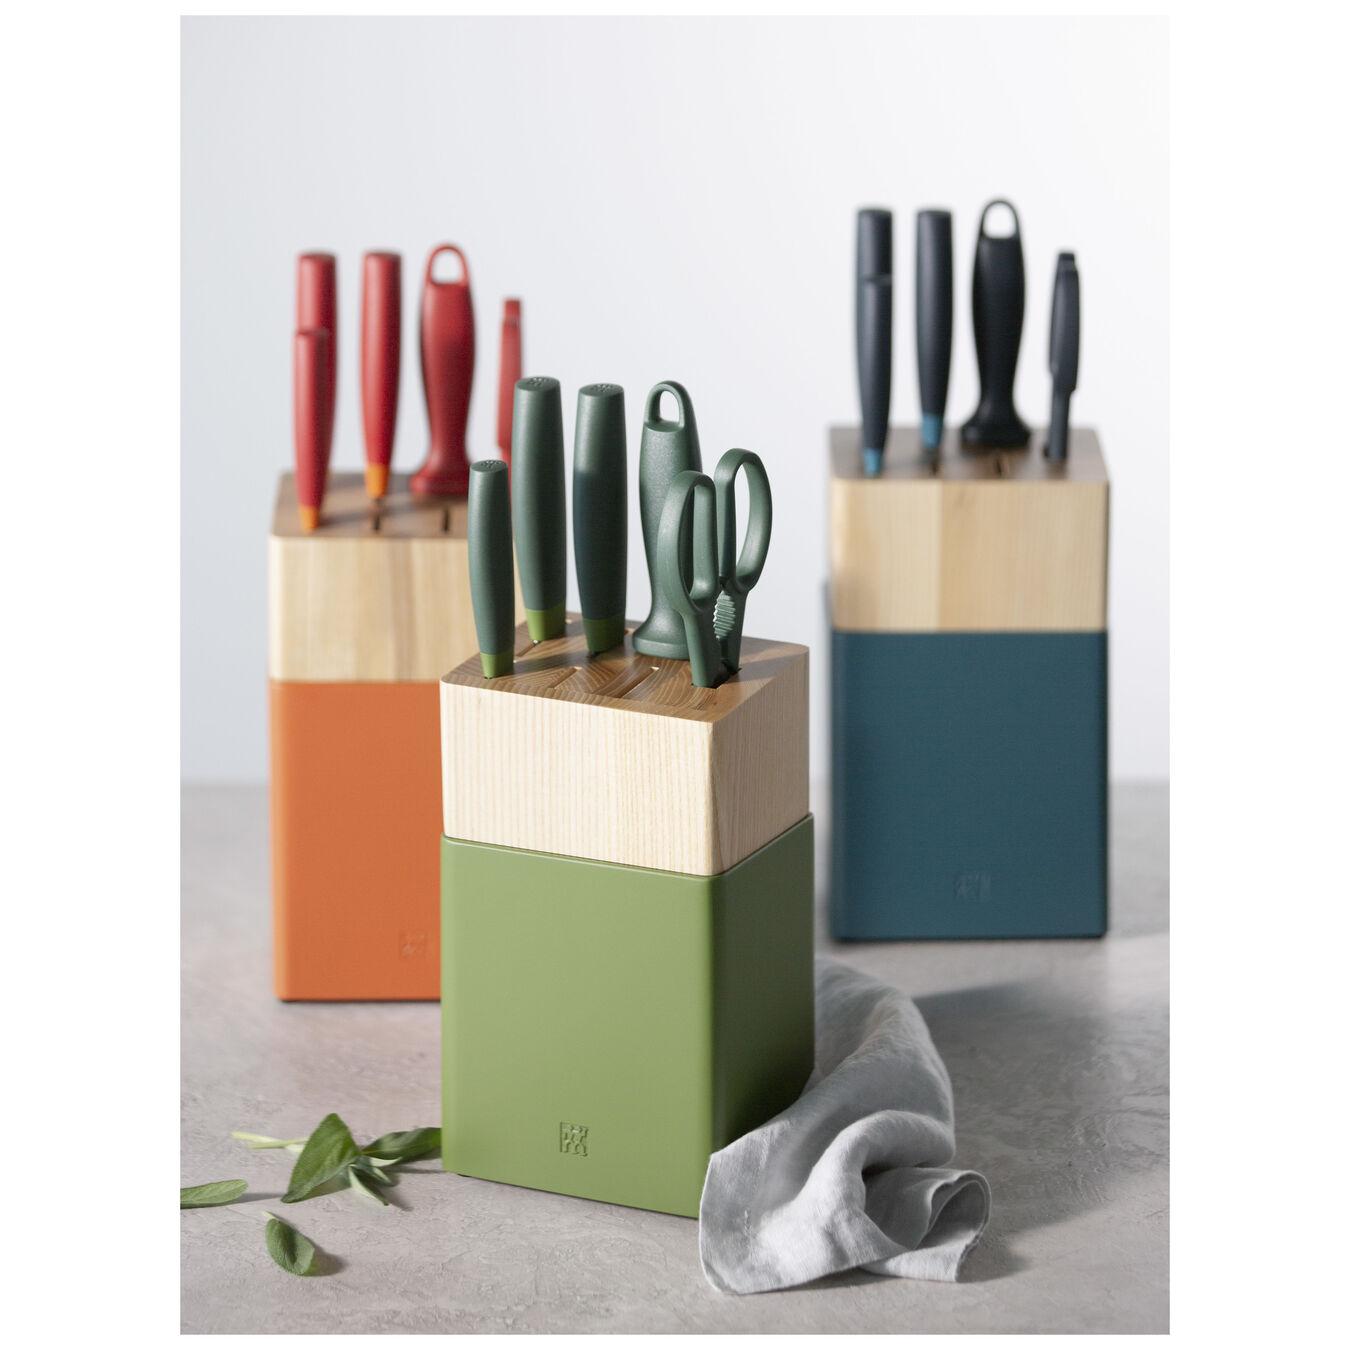 8-pc Knife Block Set - Lime Green,,large 4